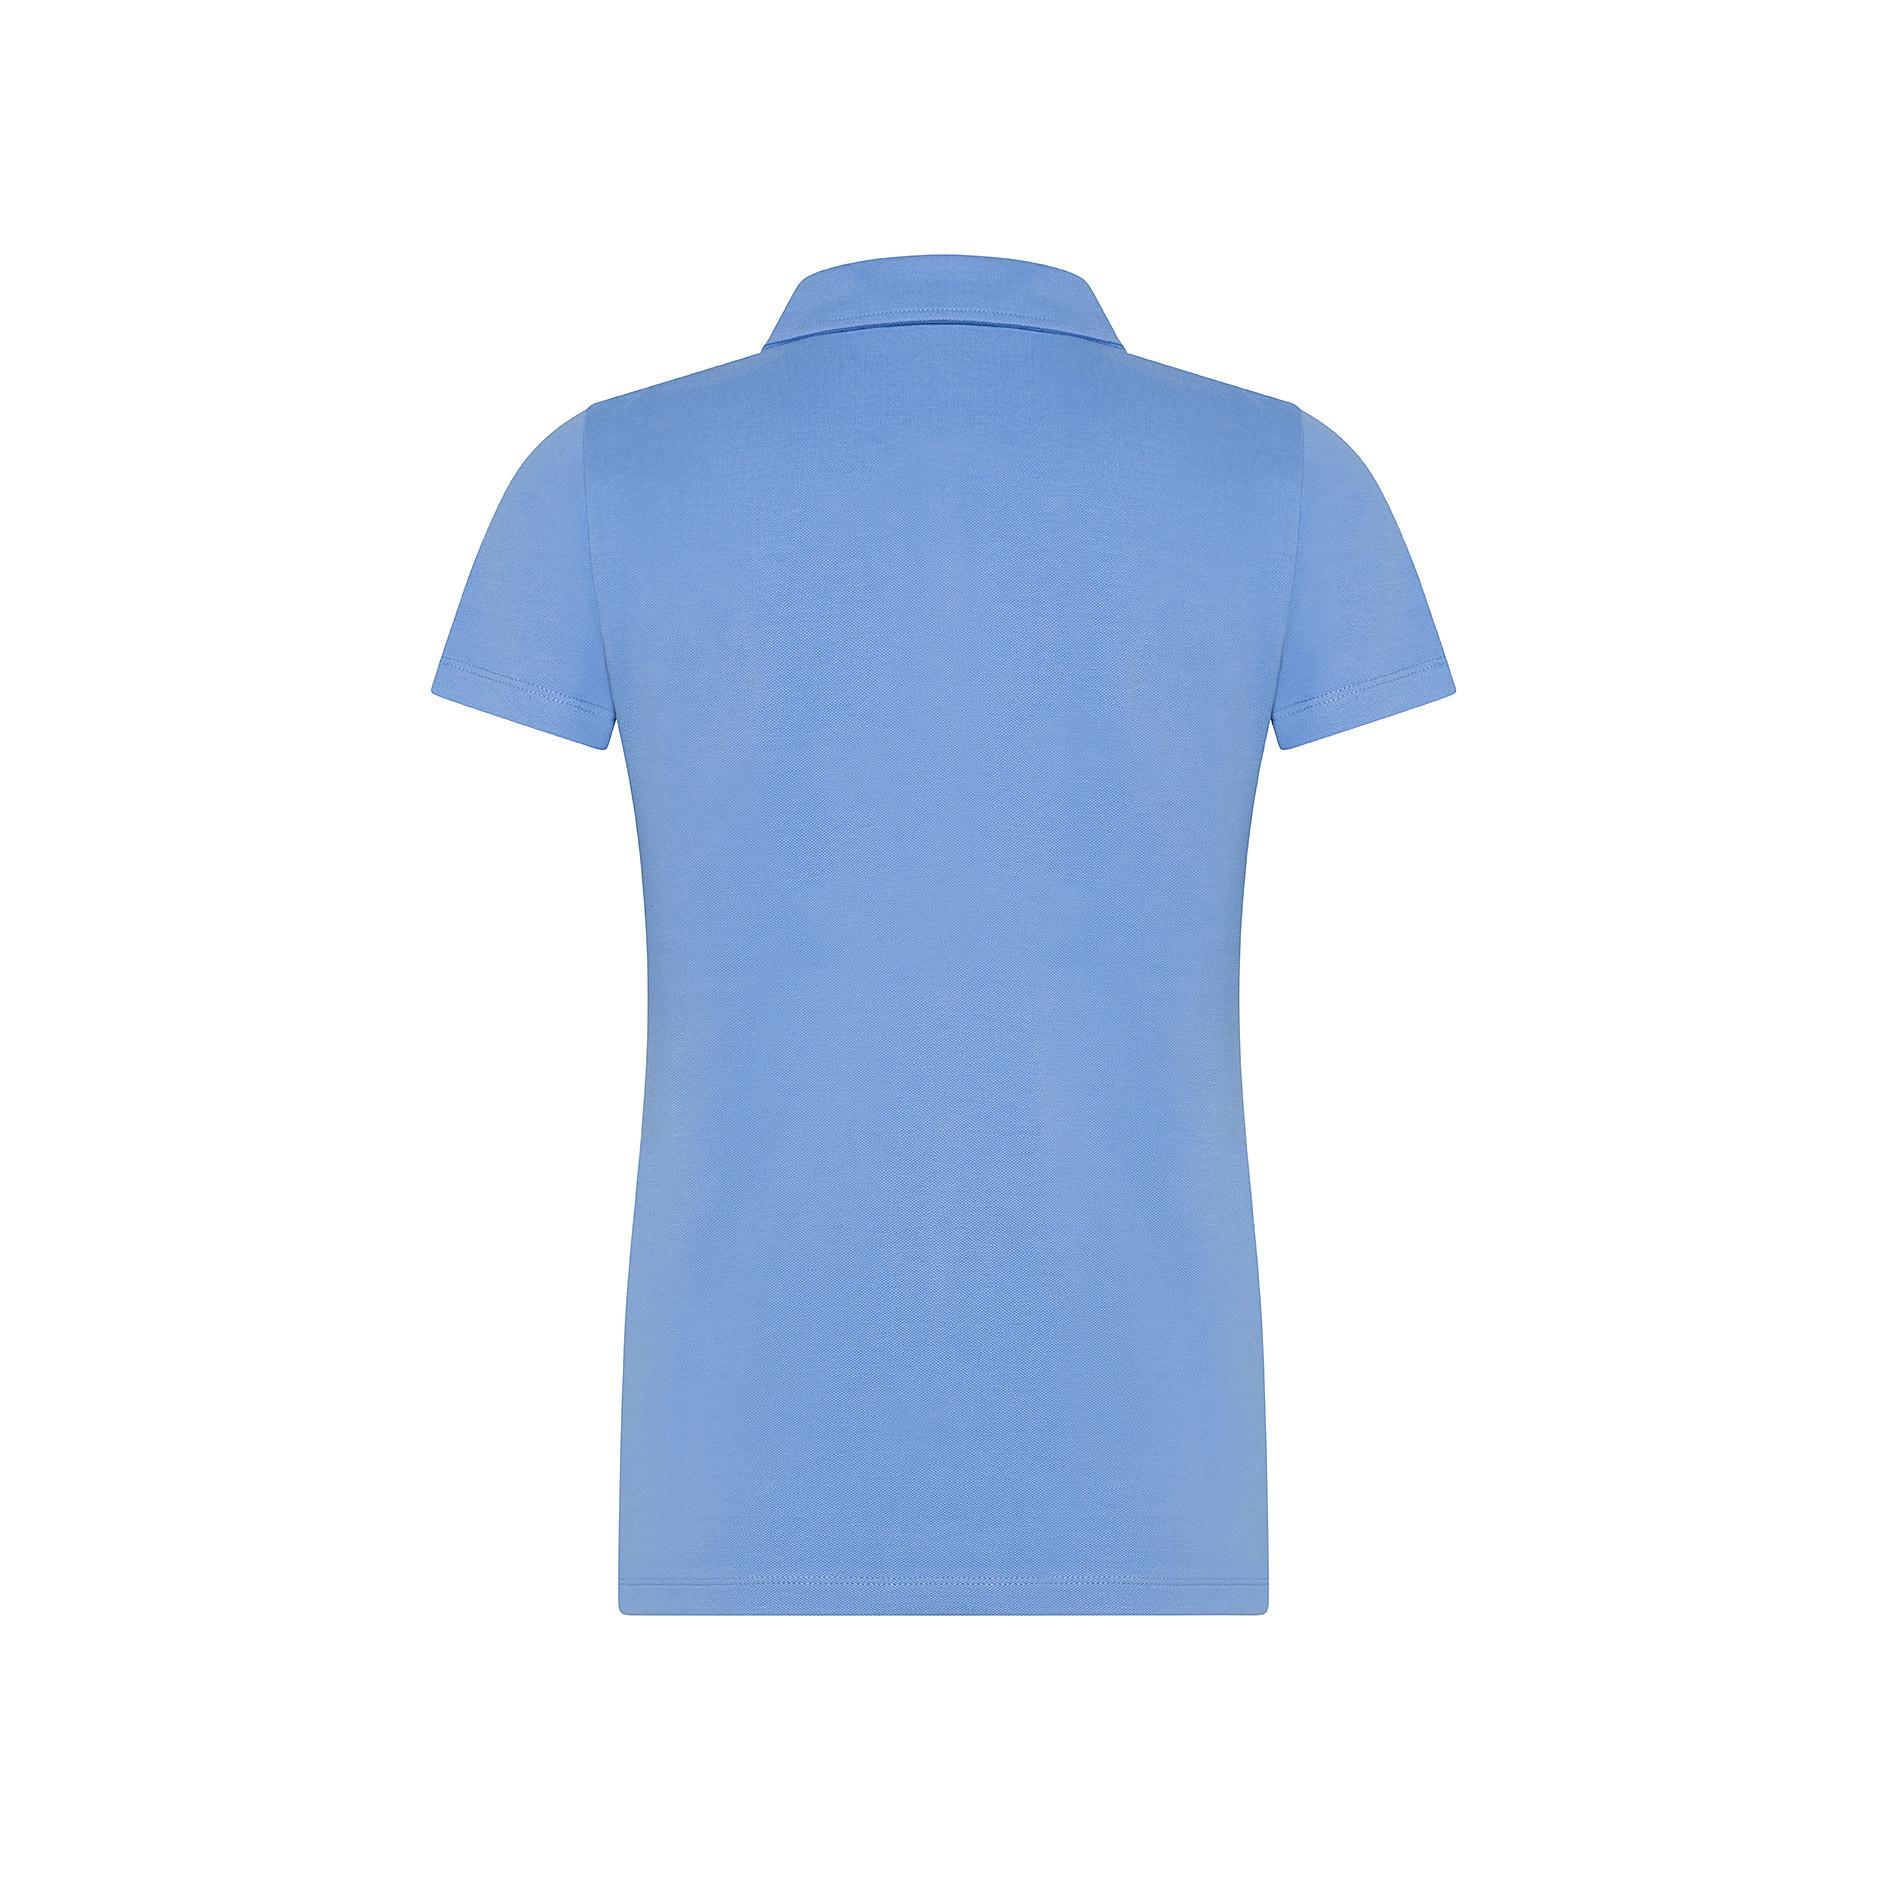 Polo cotone tinta unita, Azzurro, large image number 1